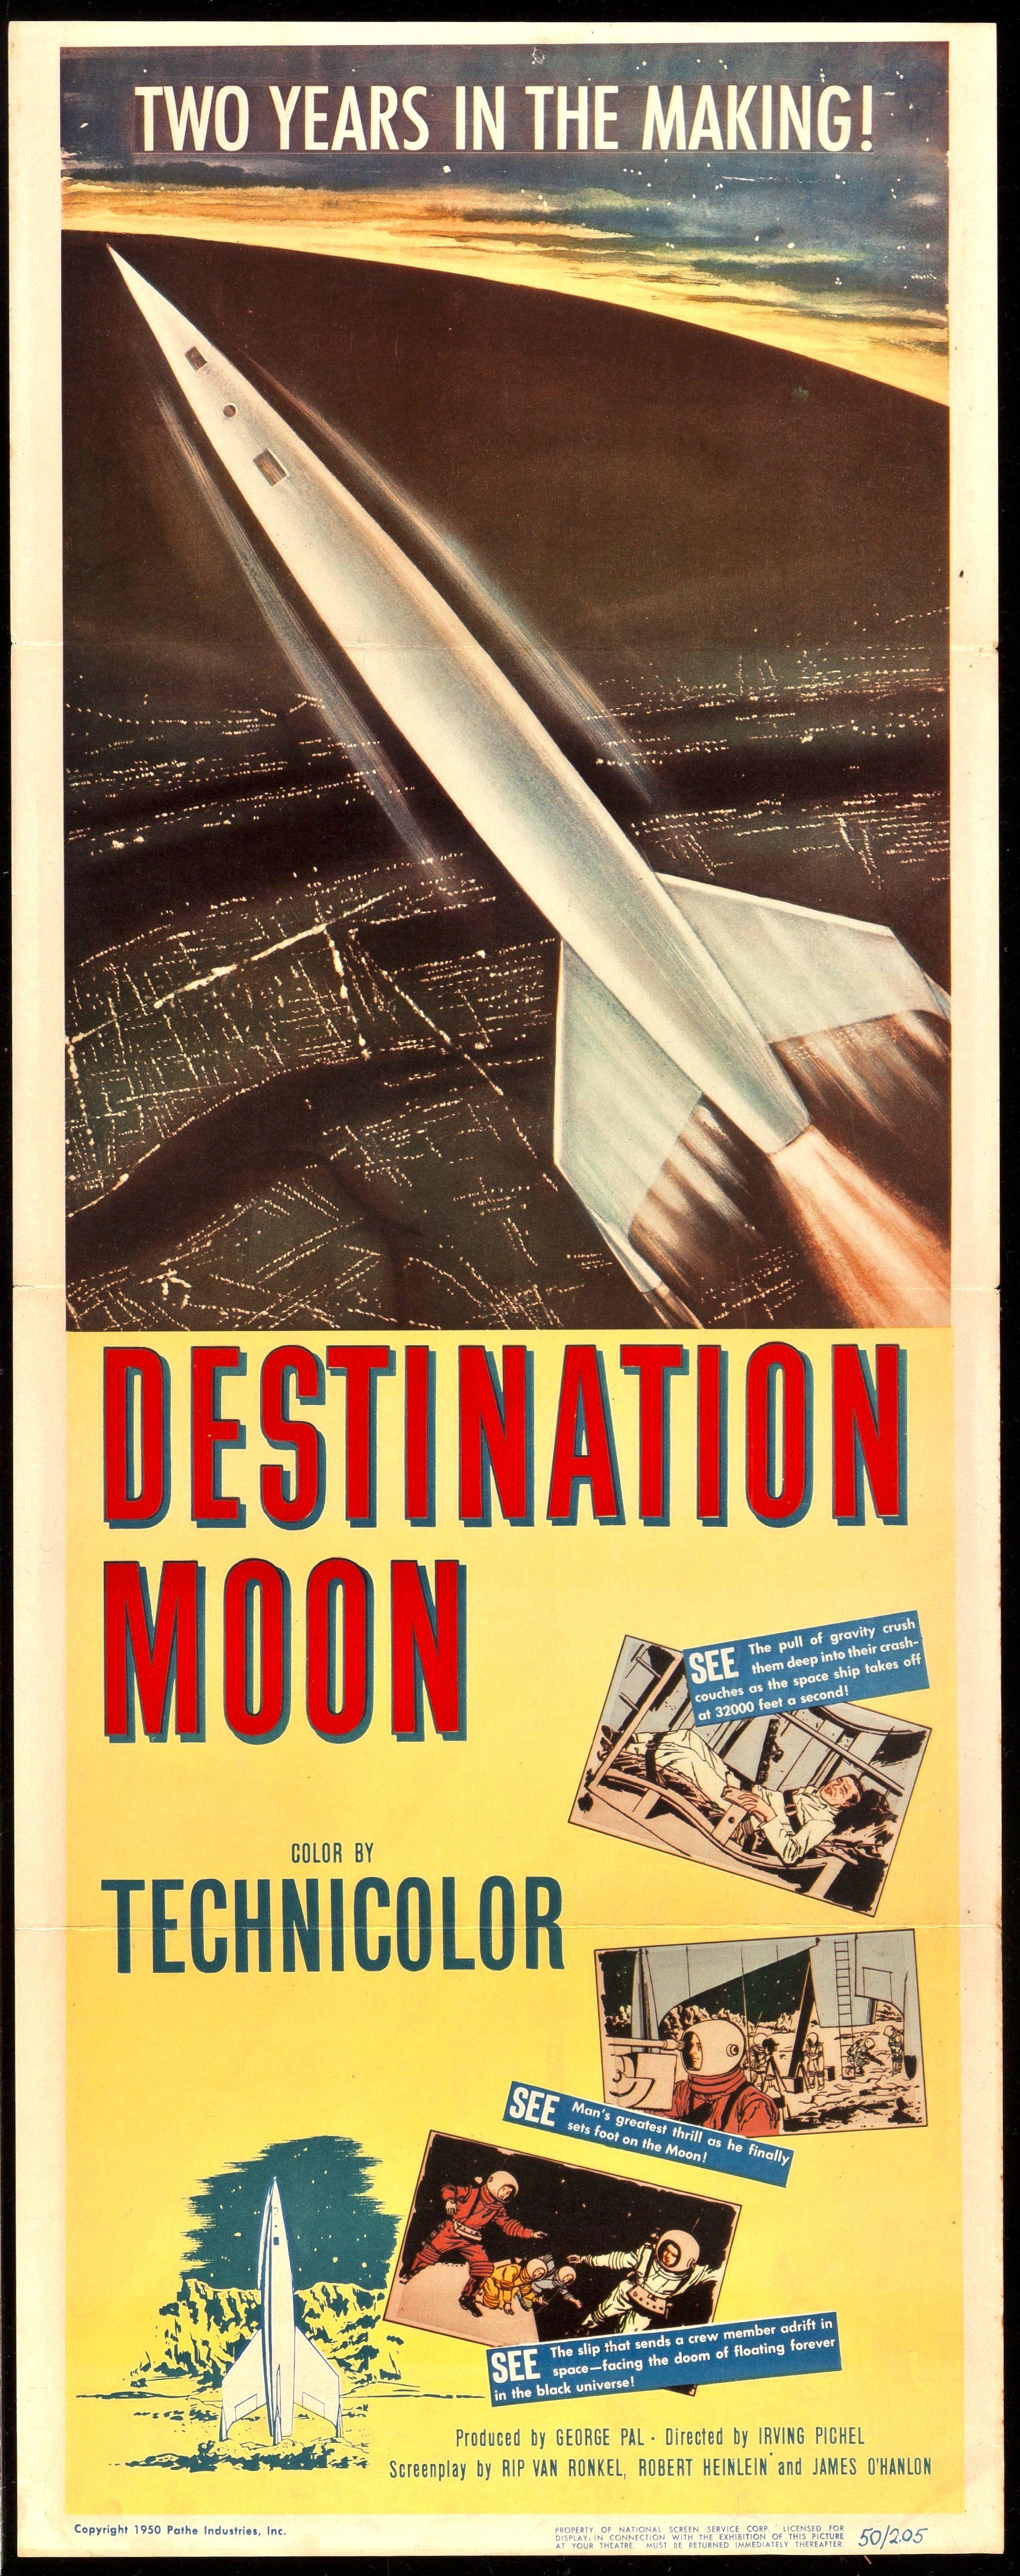 Destination moon 1950 science fiction movie posters